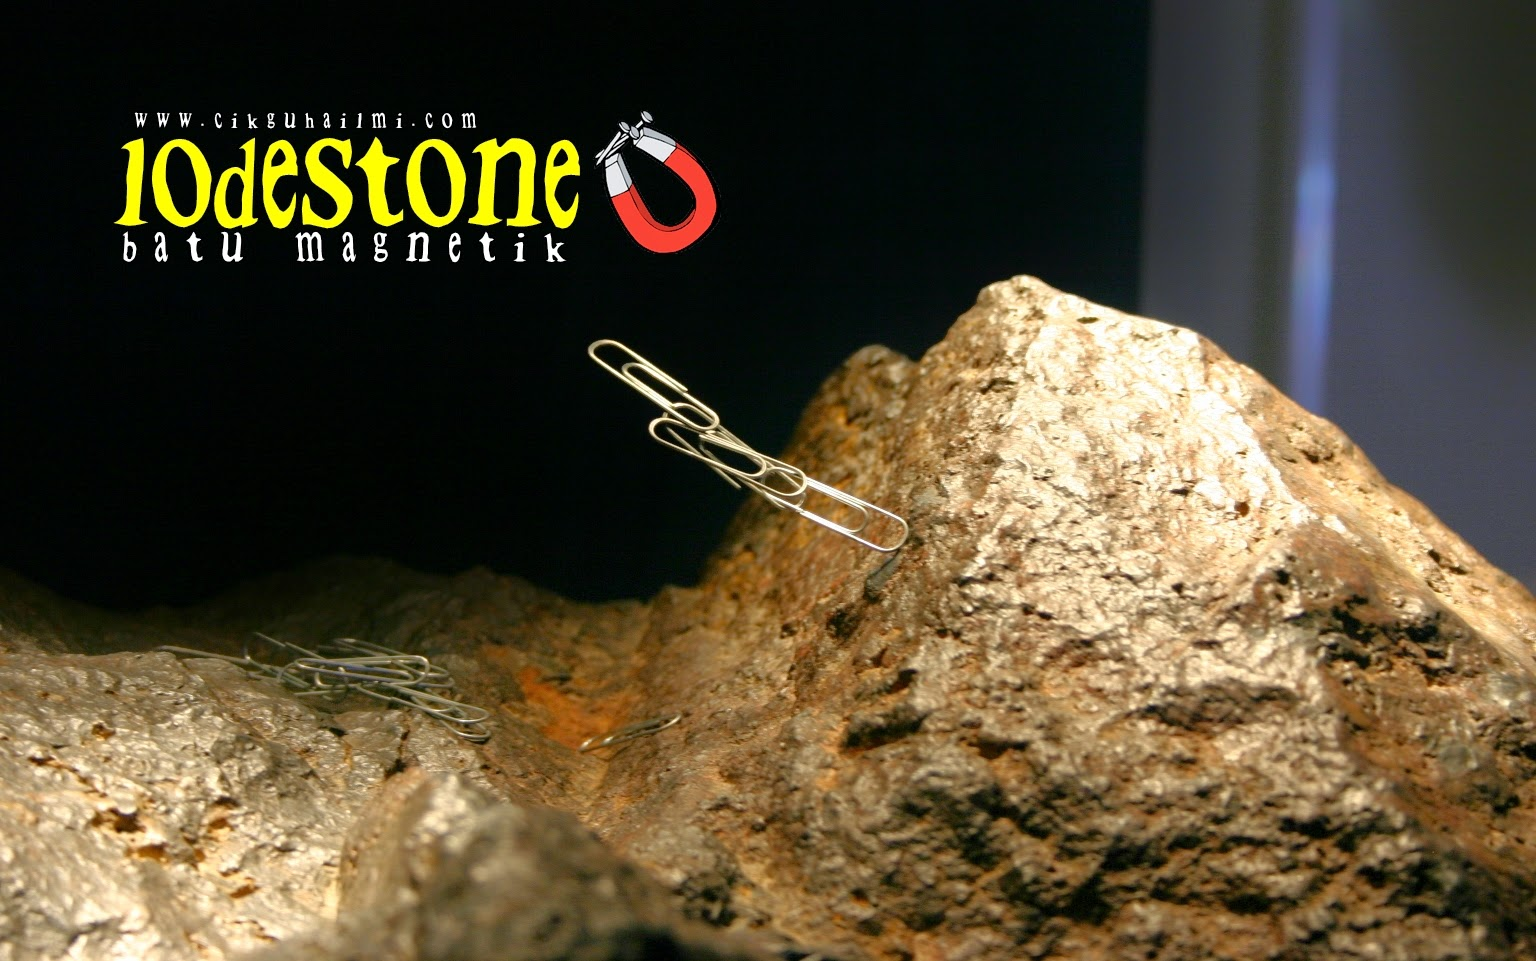 Lodestone batu magnetik